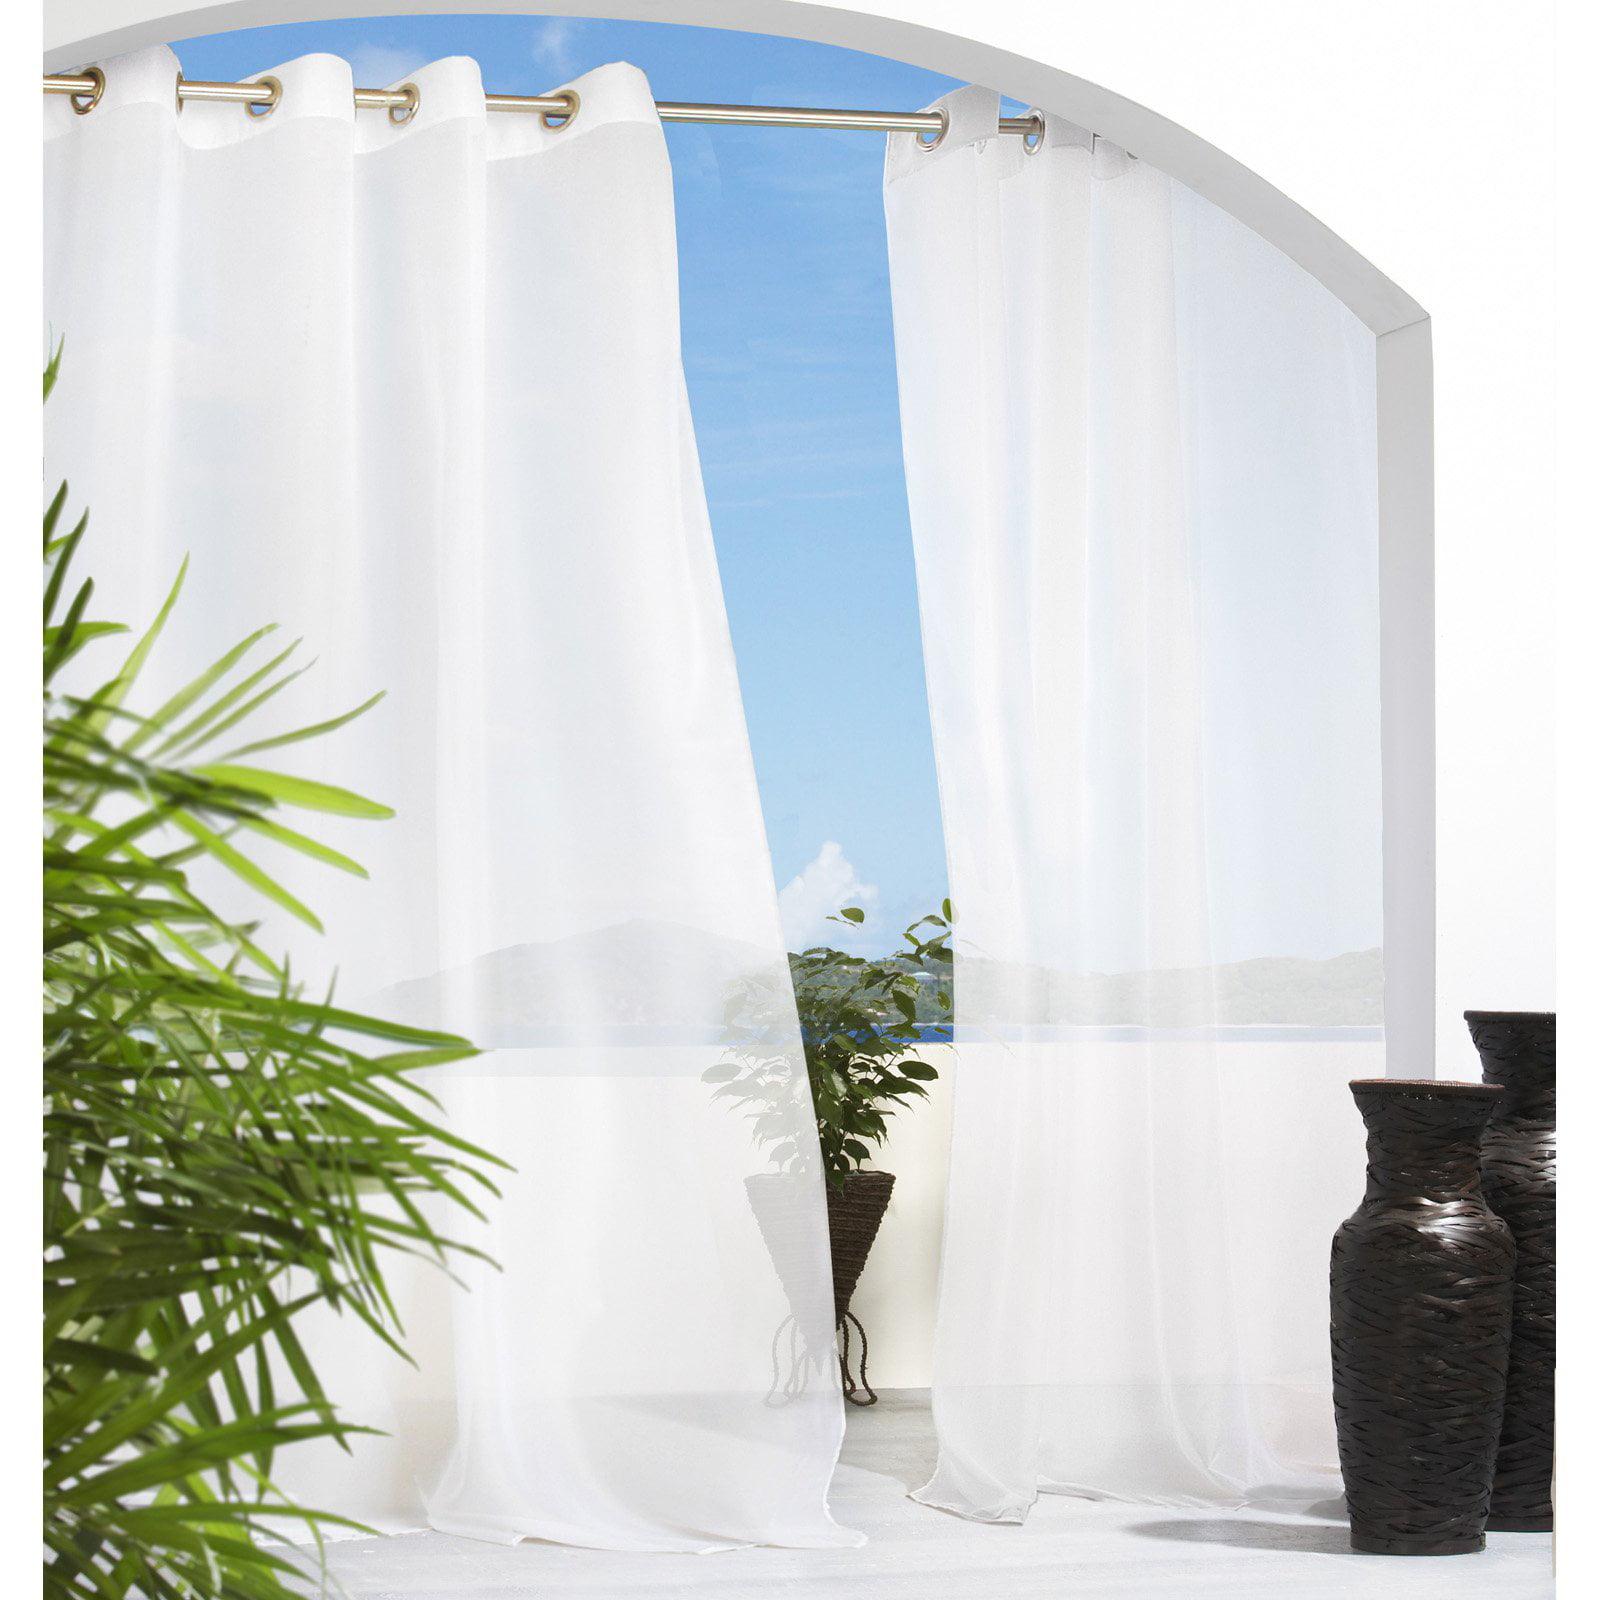 Sheer outdoor curtains - Sheer Outdoor Curtains